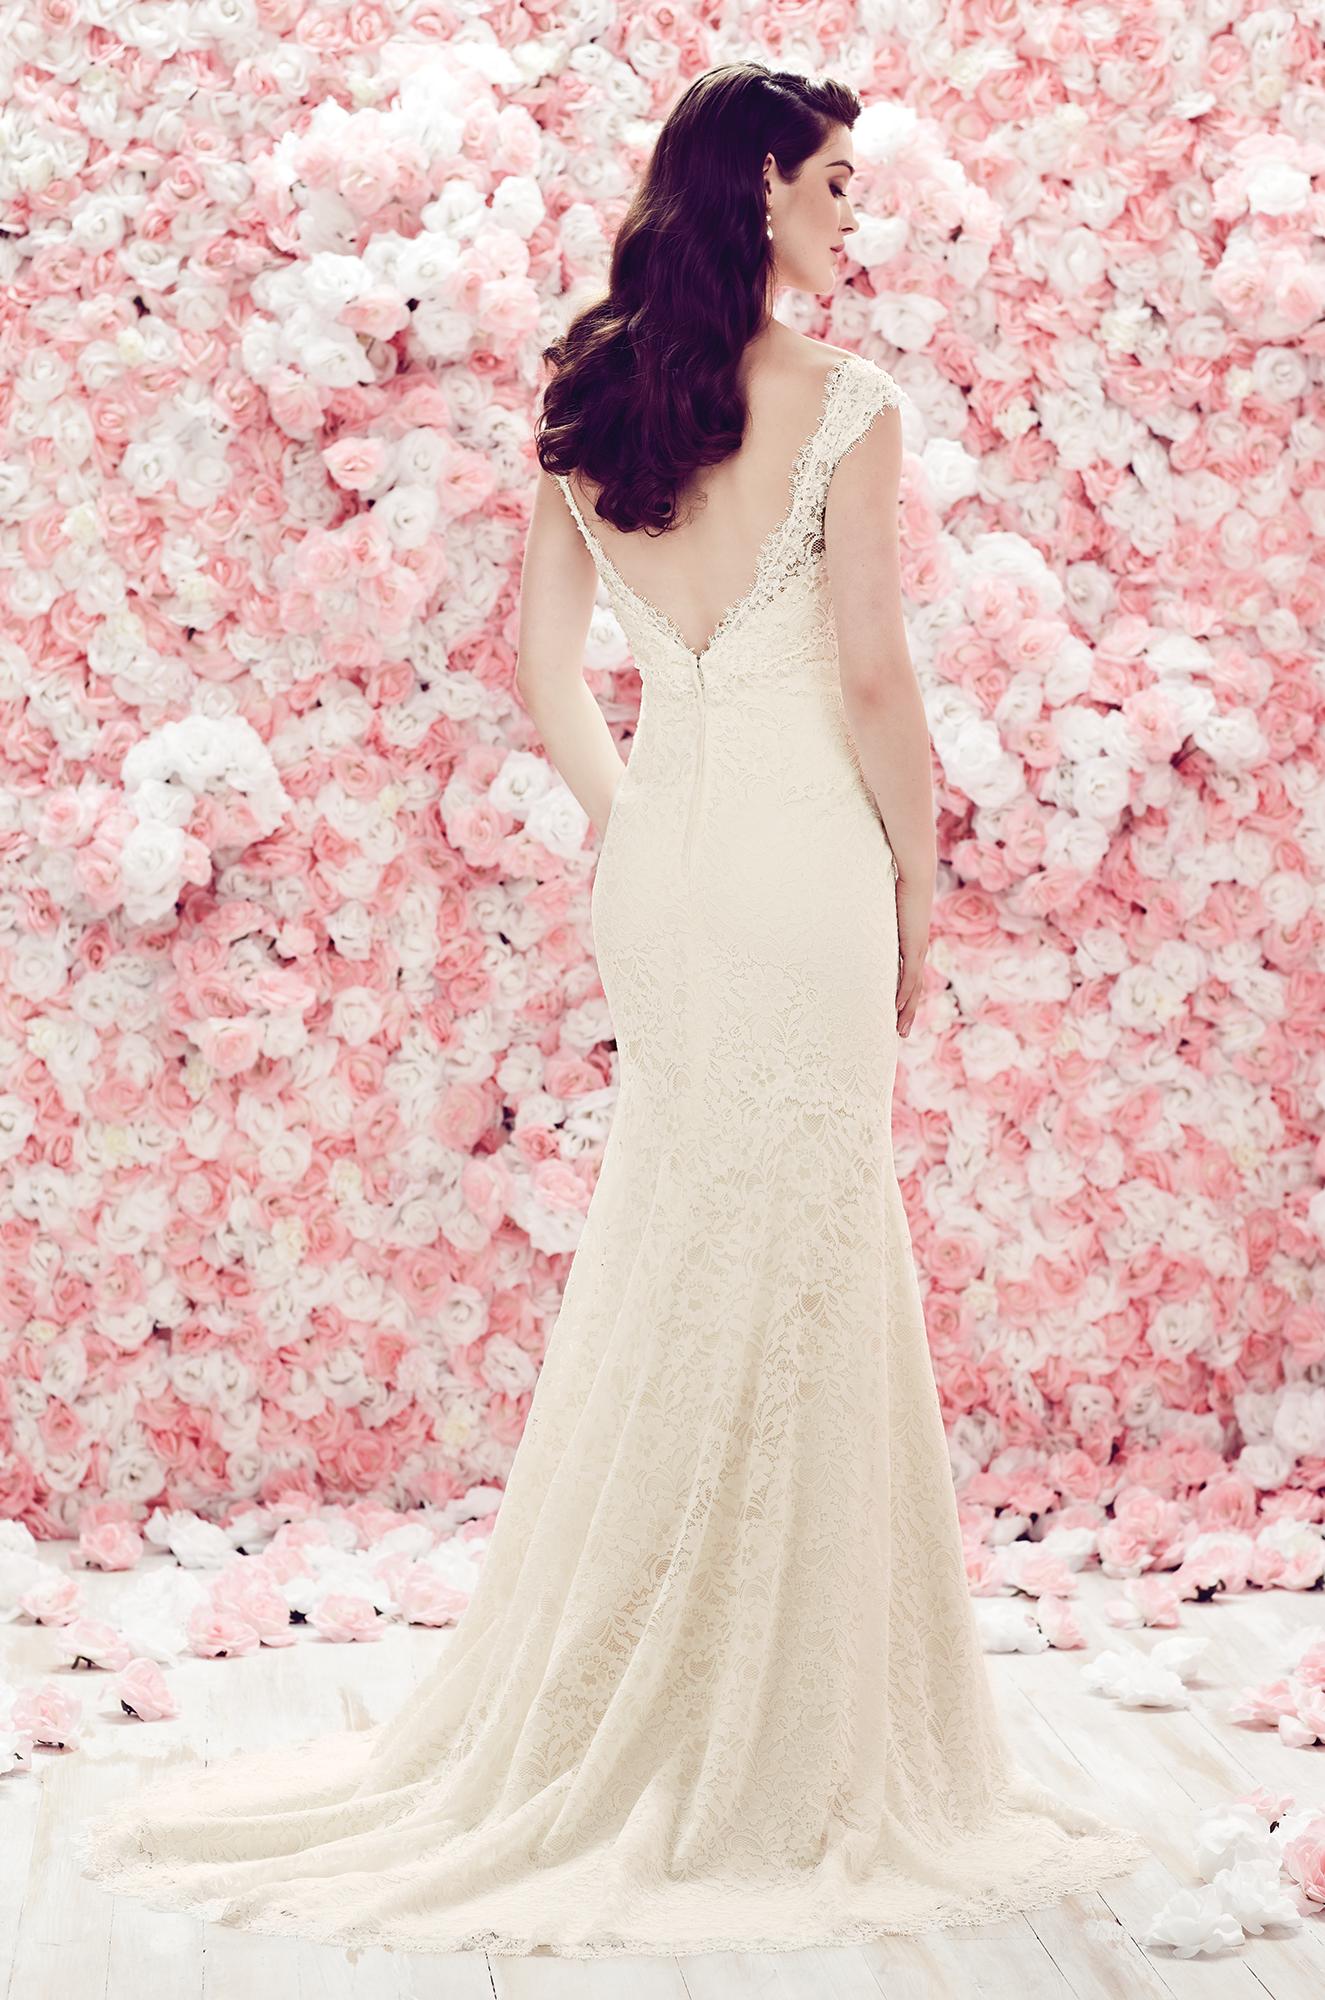 The Best Wedding Dress Designers Part 10   Pinterest   Boda formal ...